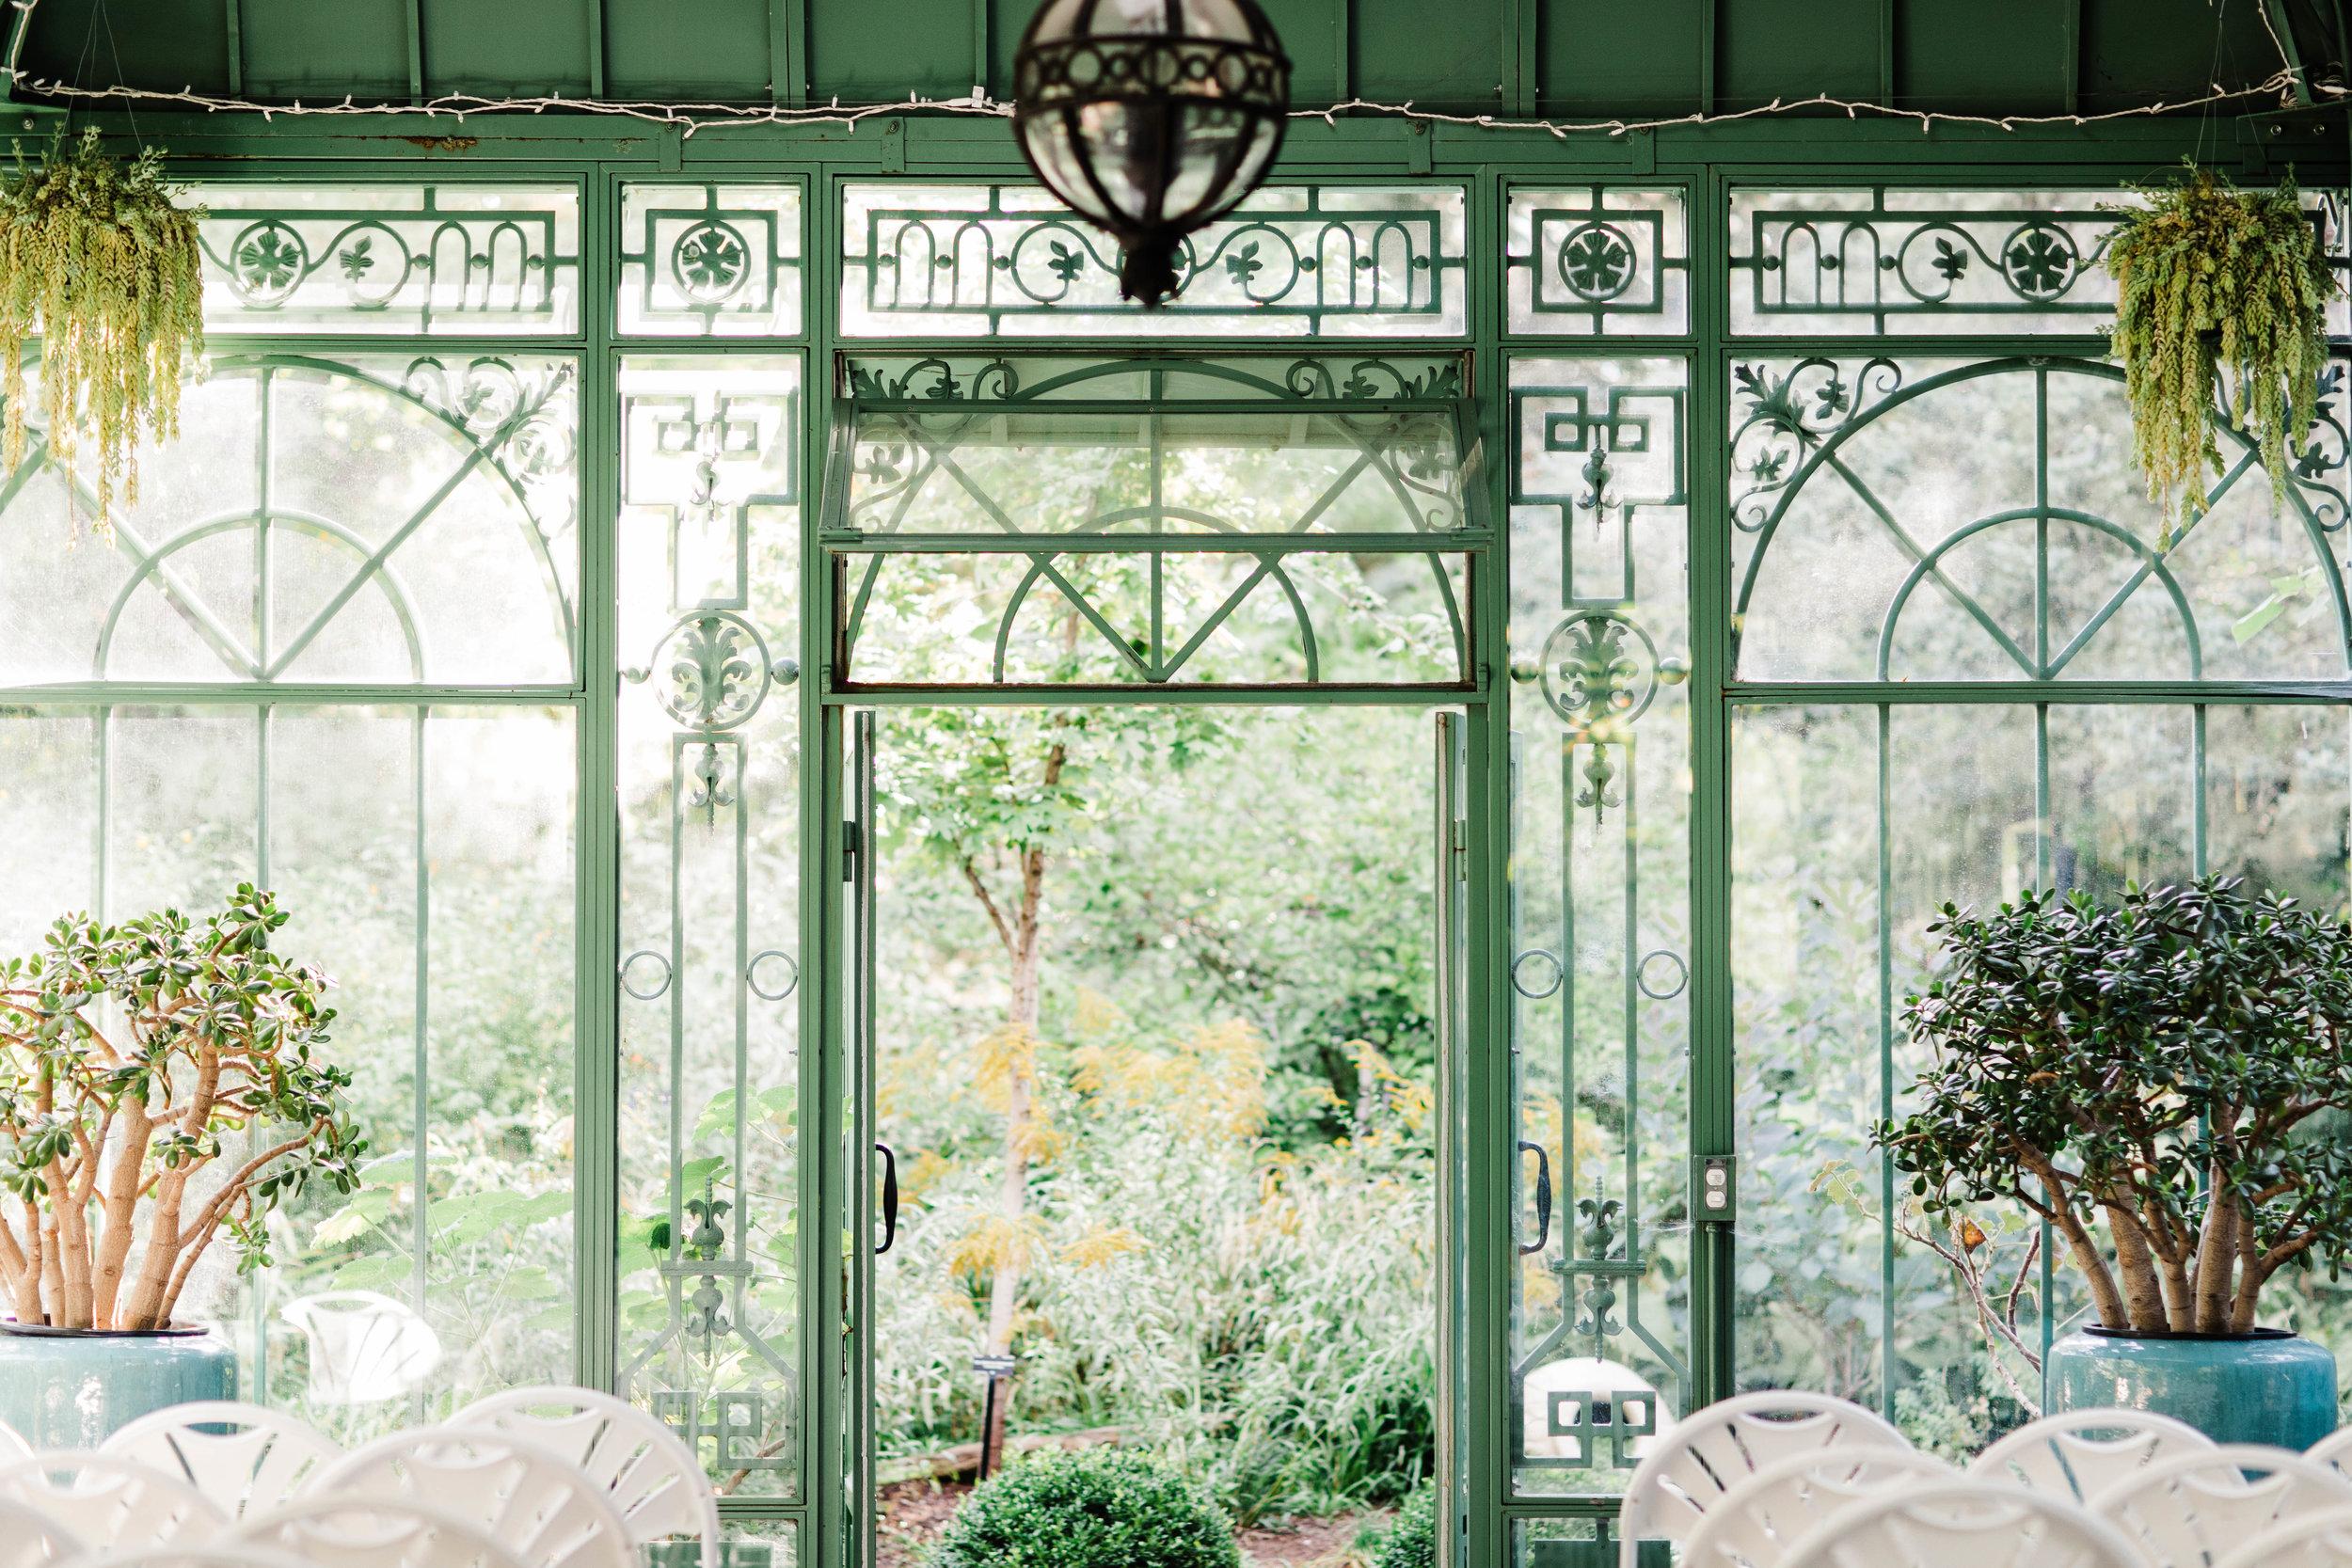 Top 20 wedding venues in Colorado | Denver Botanic Gardens | Colorado Rocky Mountain wedding photographers